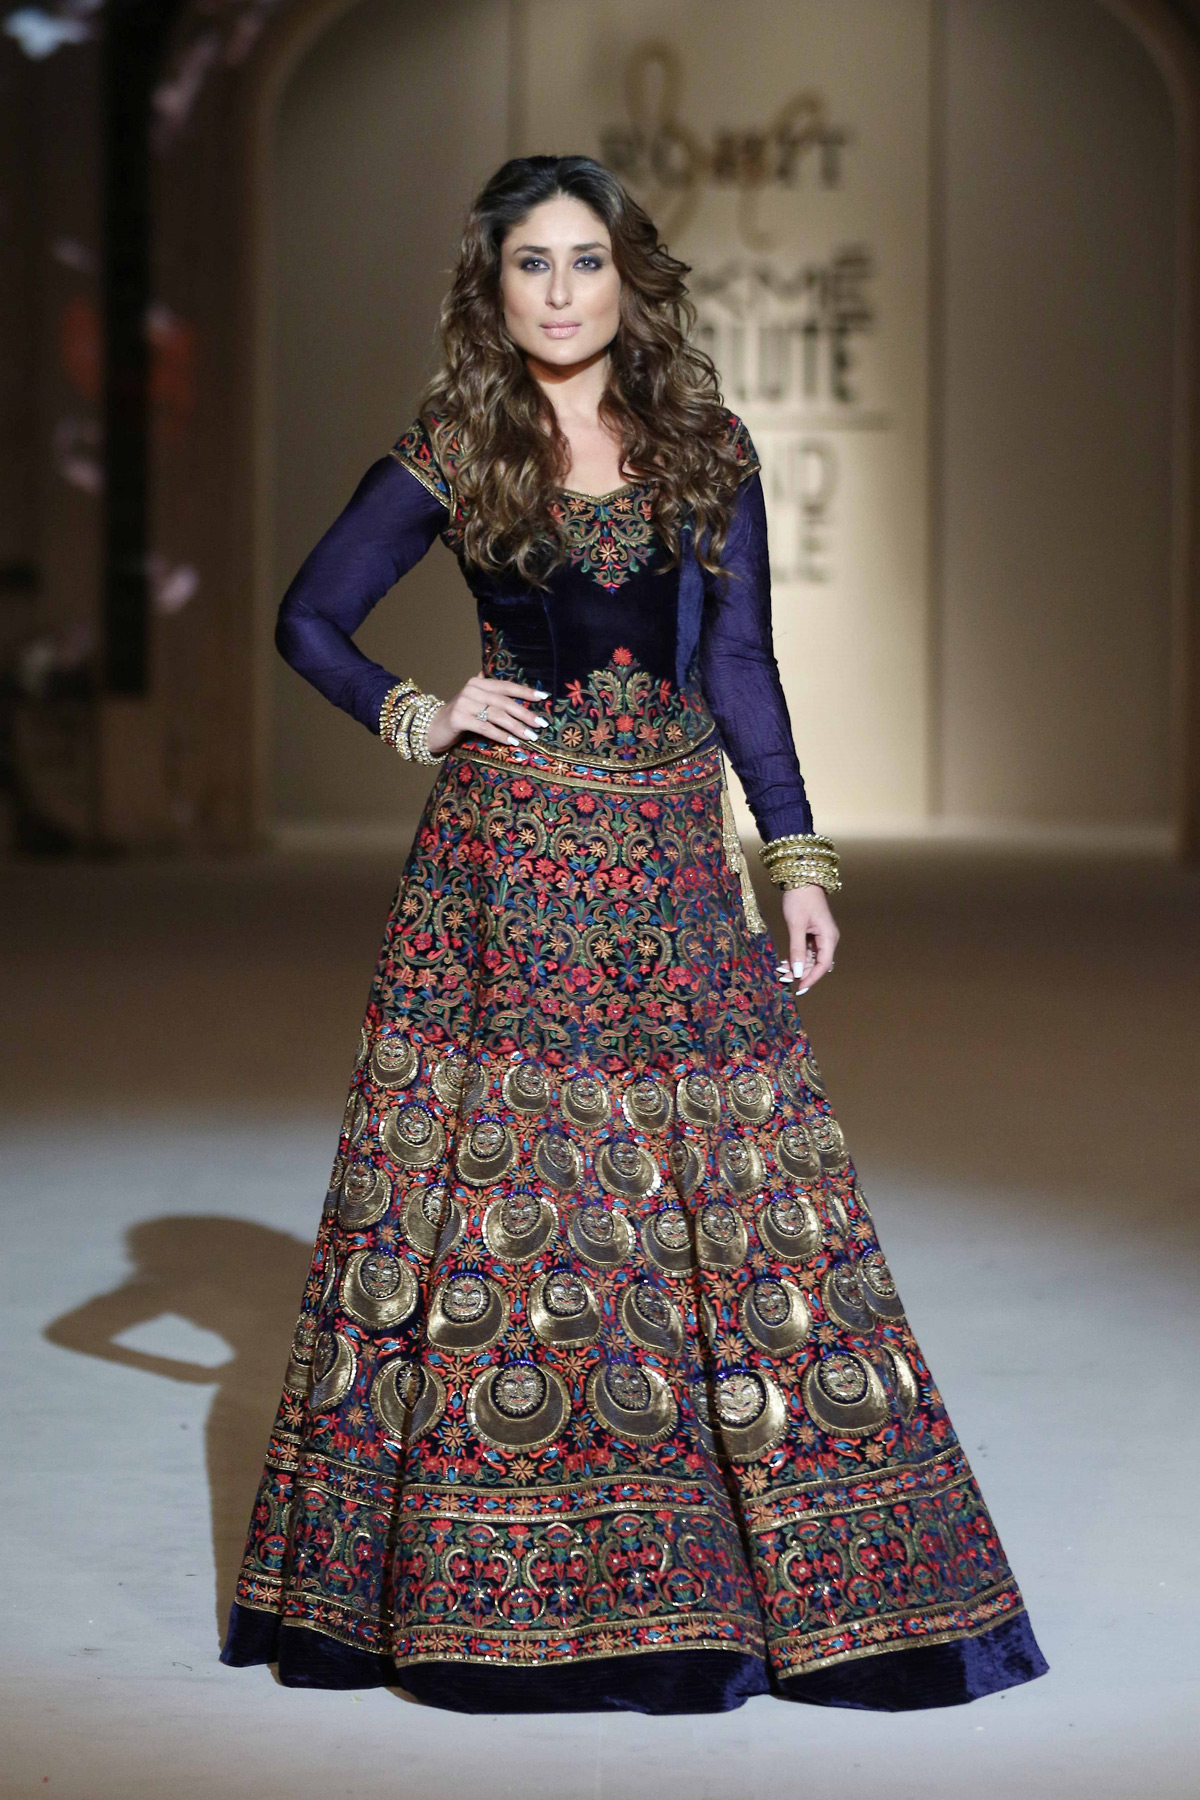 Lakme-Absolute-Brand-Ambassador-Kareena-Kapoor-at-the-Lakme-Absolute-Gra...